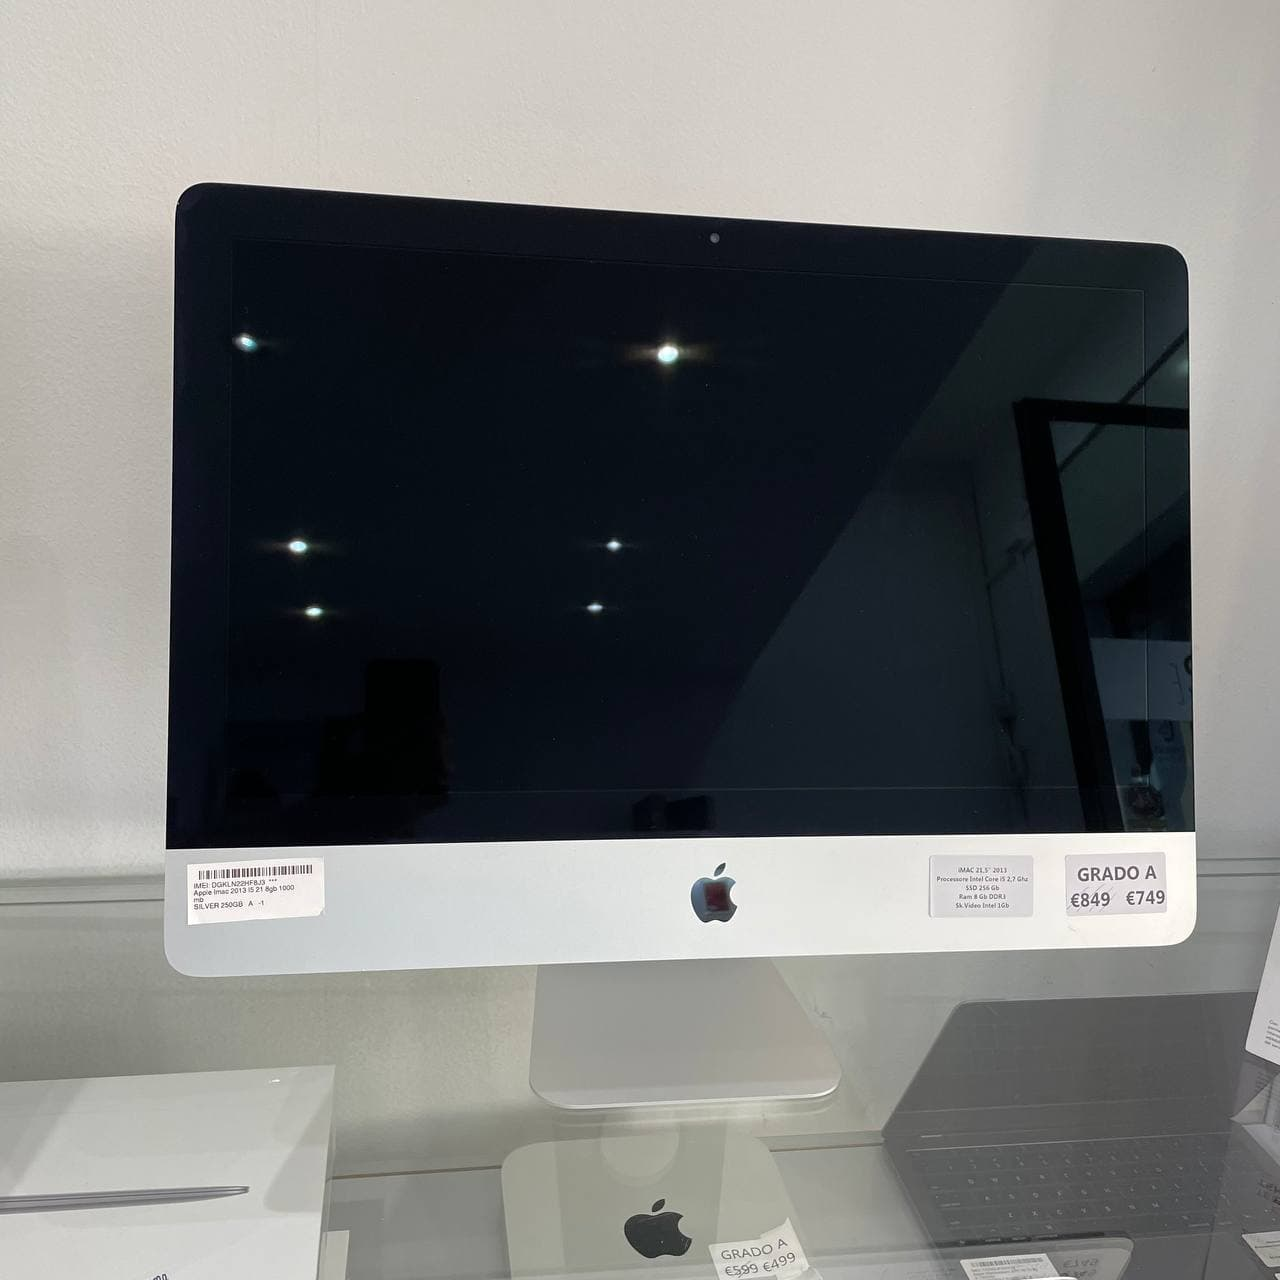 Apple iMac 2013 - intel® i5 21 - RAM 8GB 1000mb - (Ricondizionato)